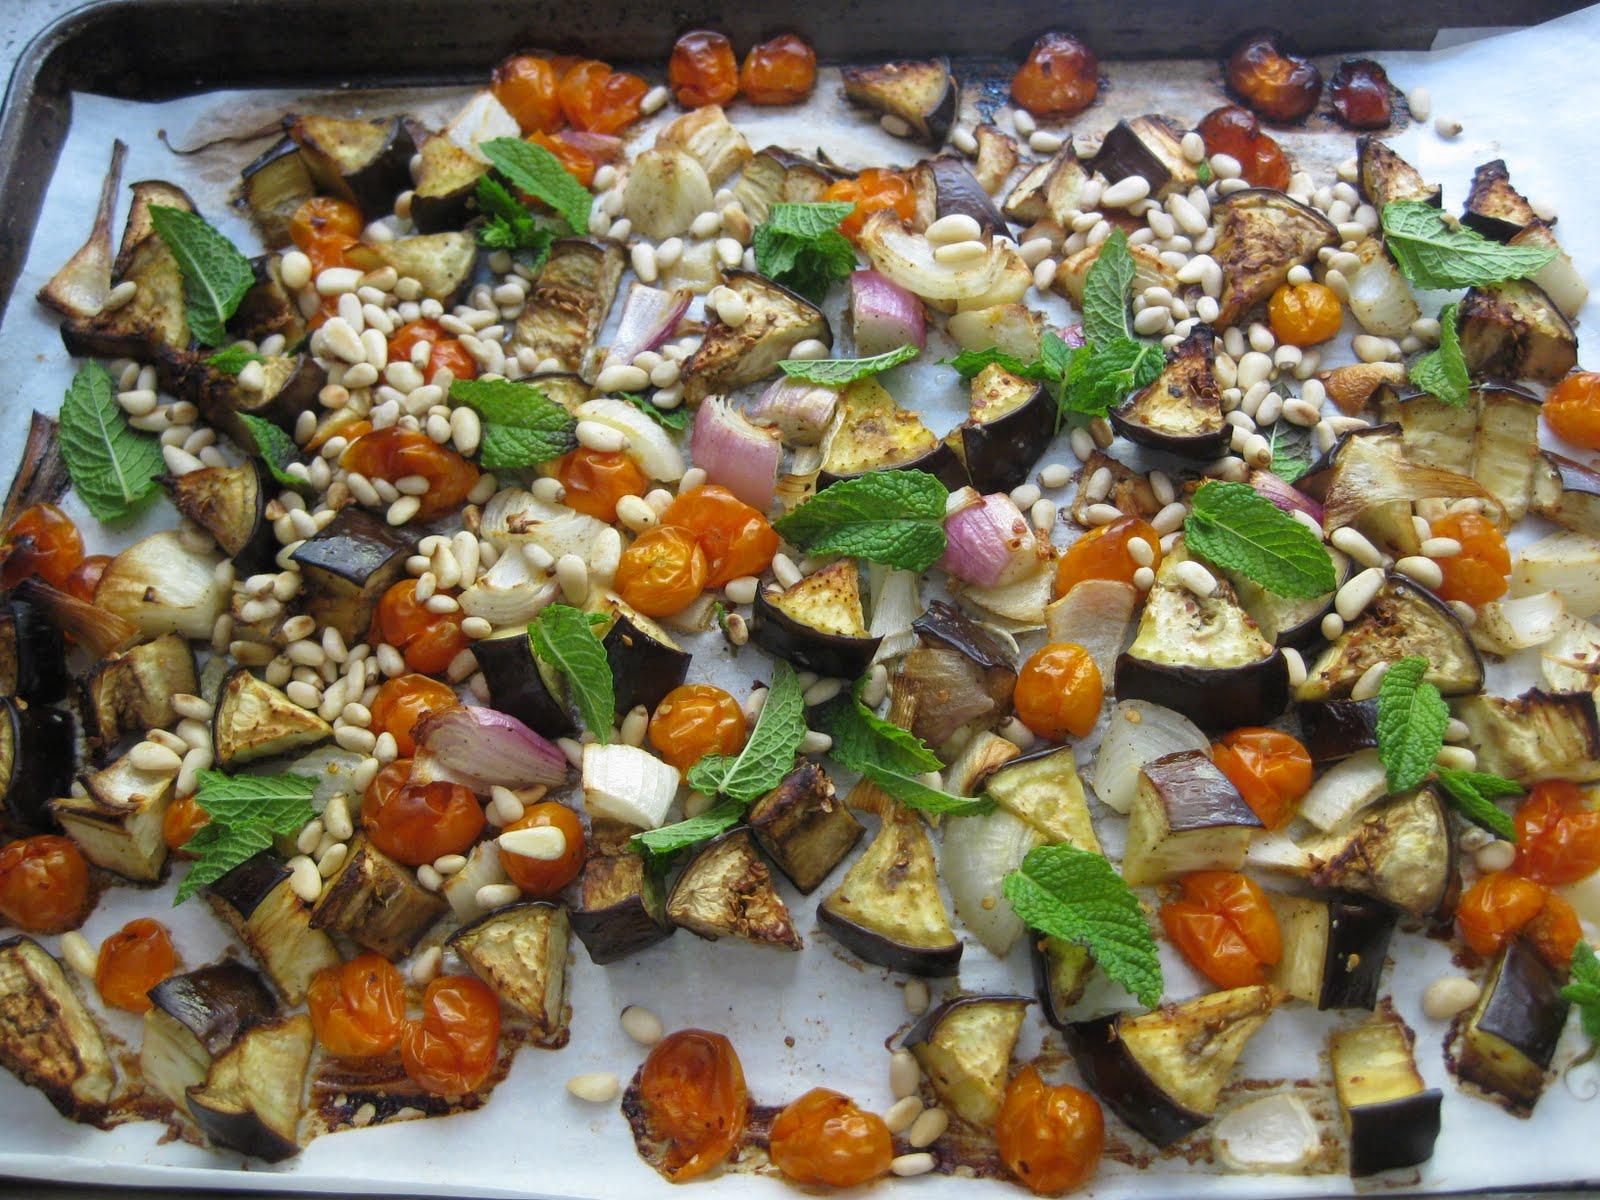 Dinner Tonight: Rigatoni with Roasted Eggplant, Tomatoes, & Mint